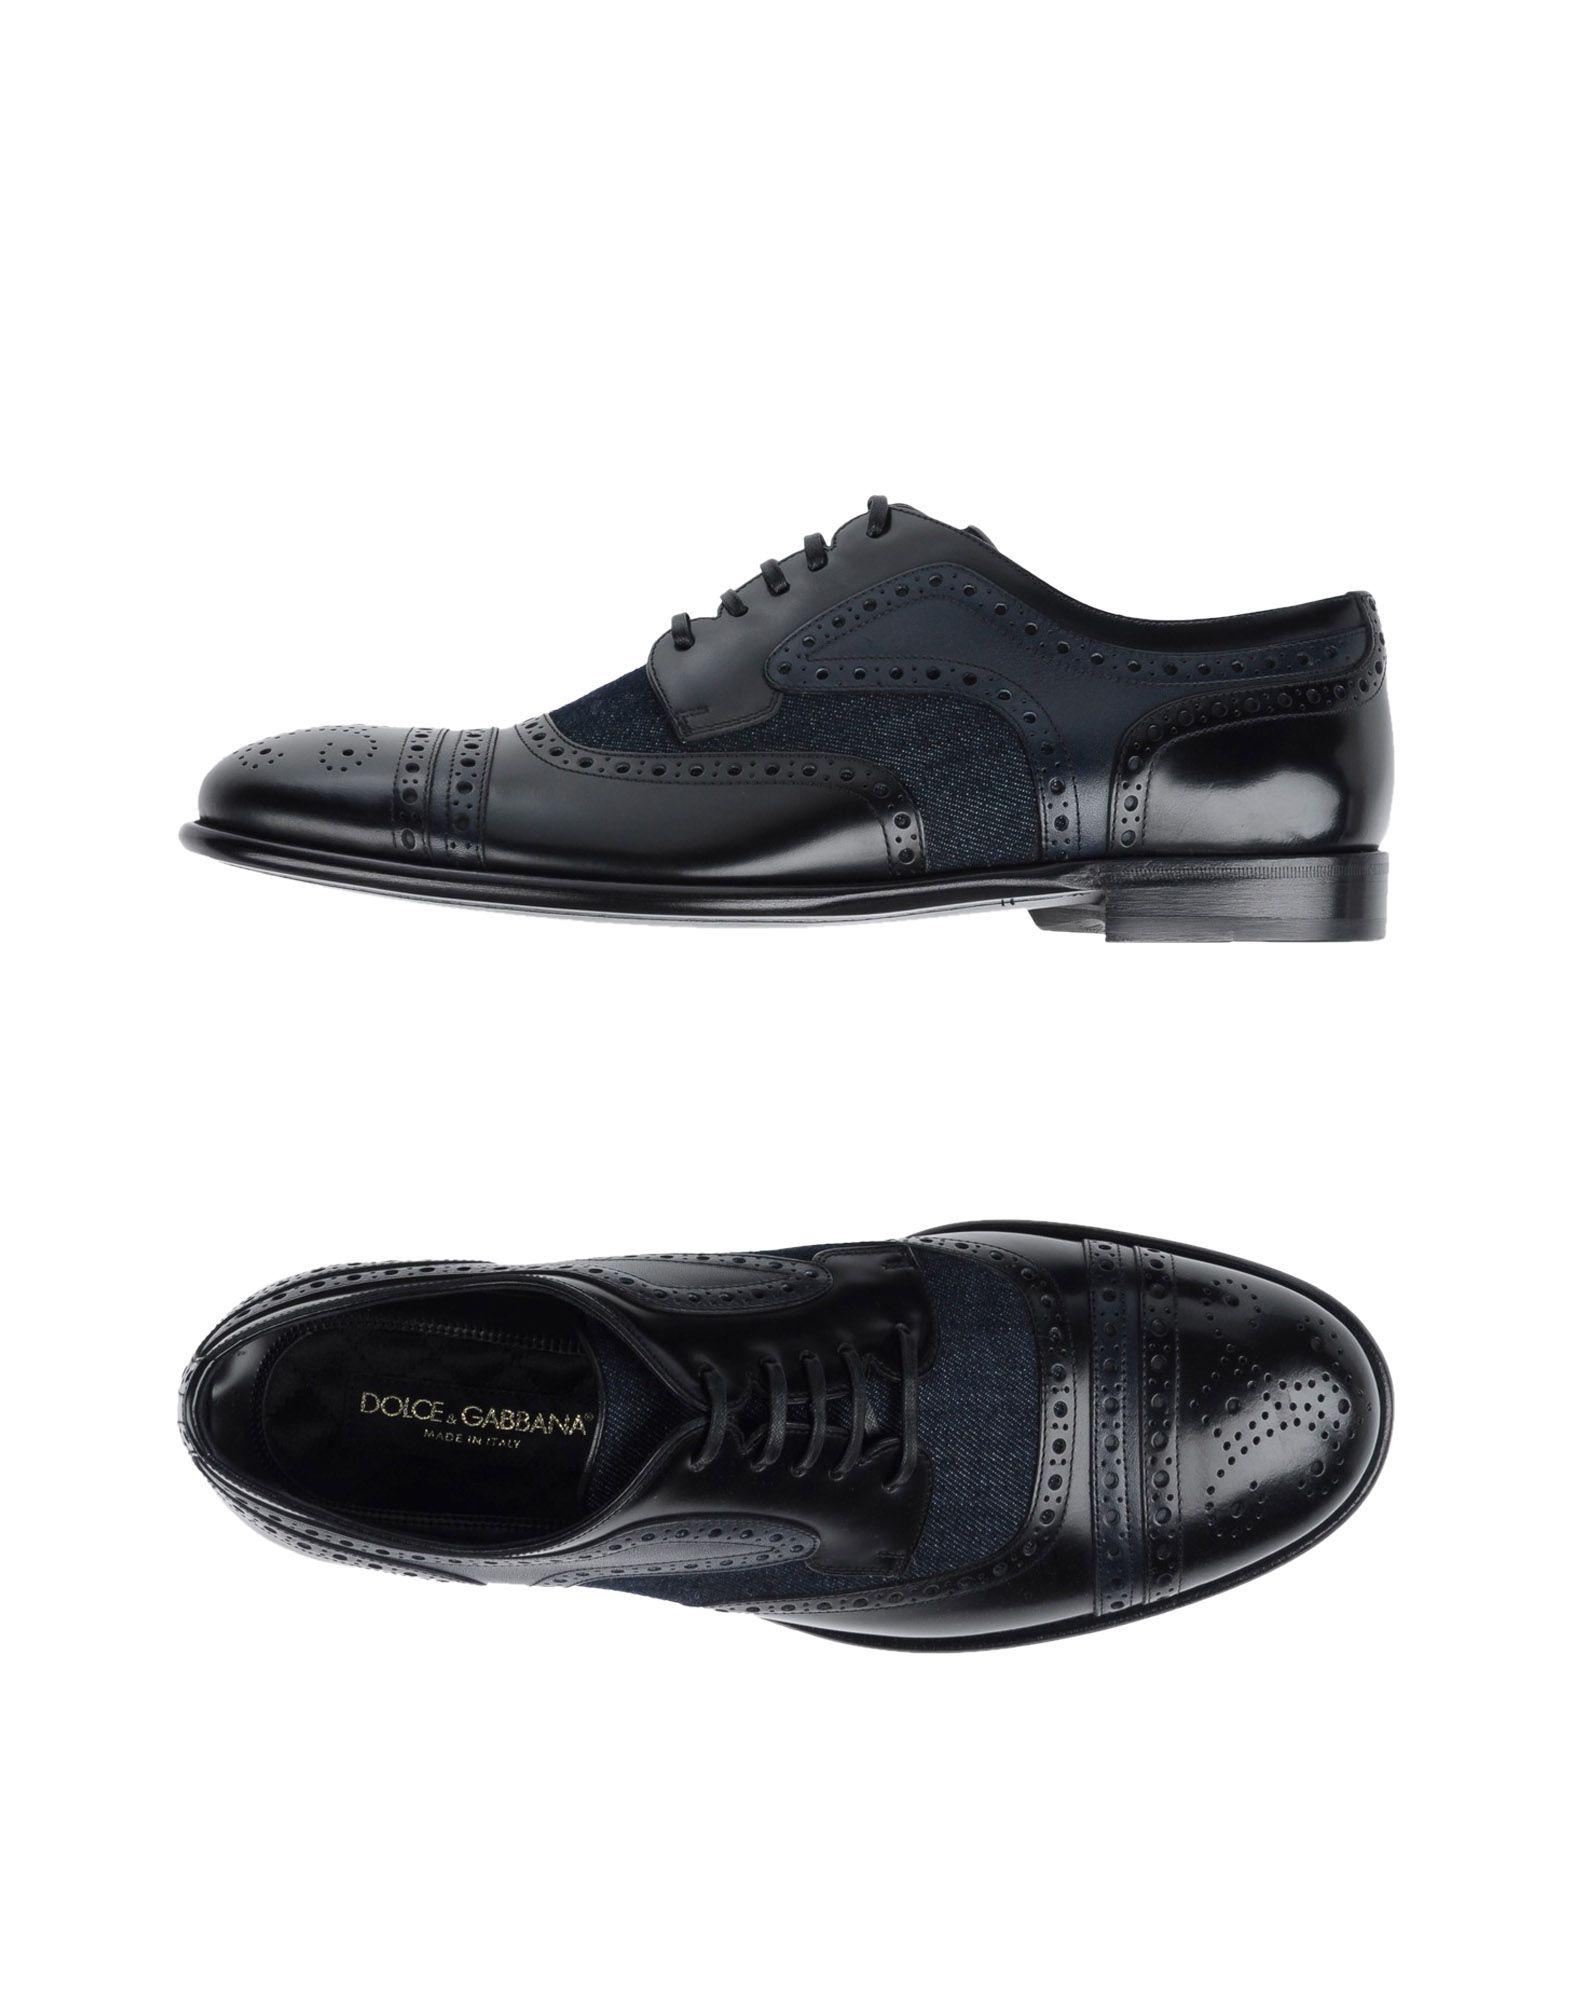 Stringate Dolce & Gabbana Uomo - Acquista online su